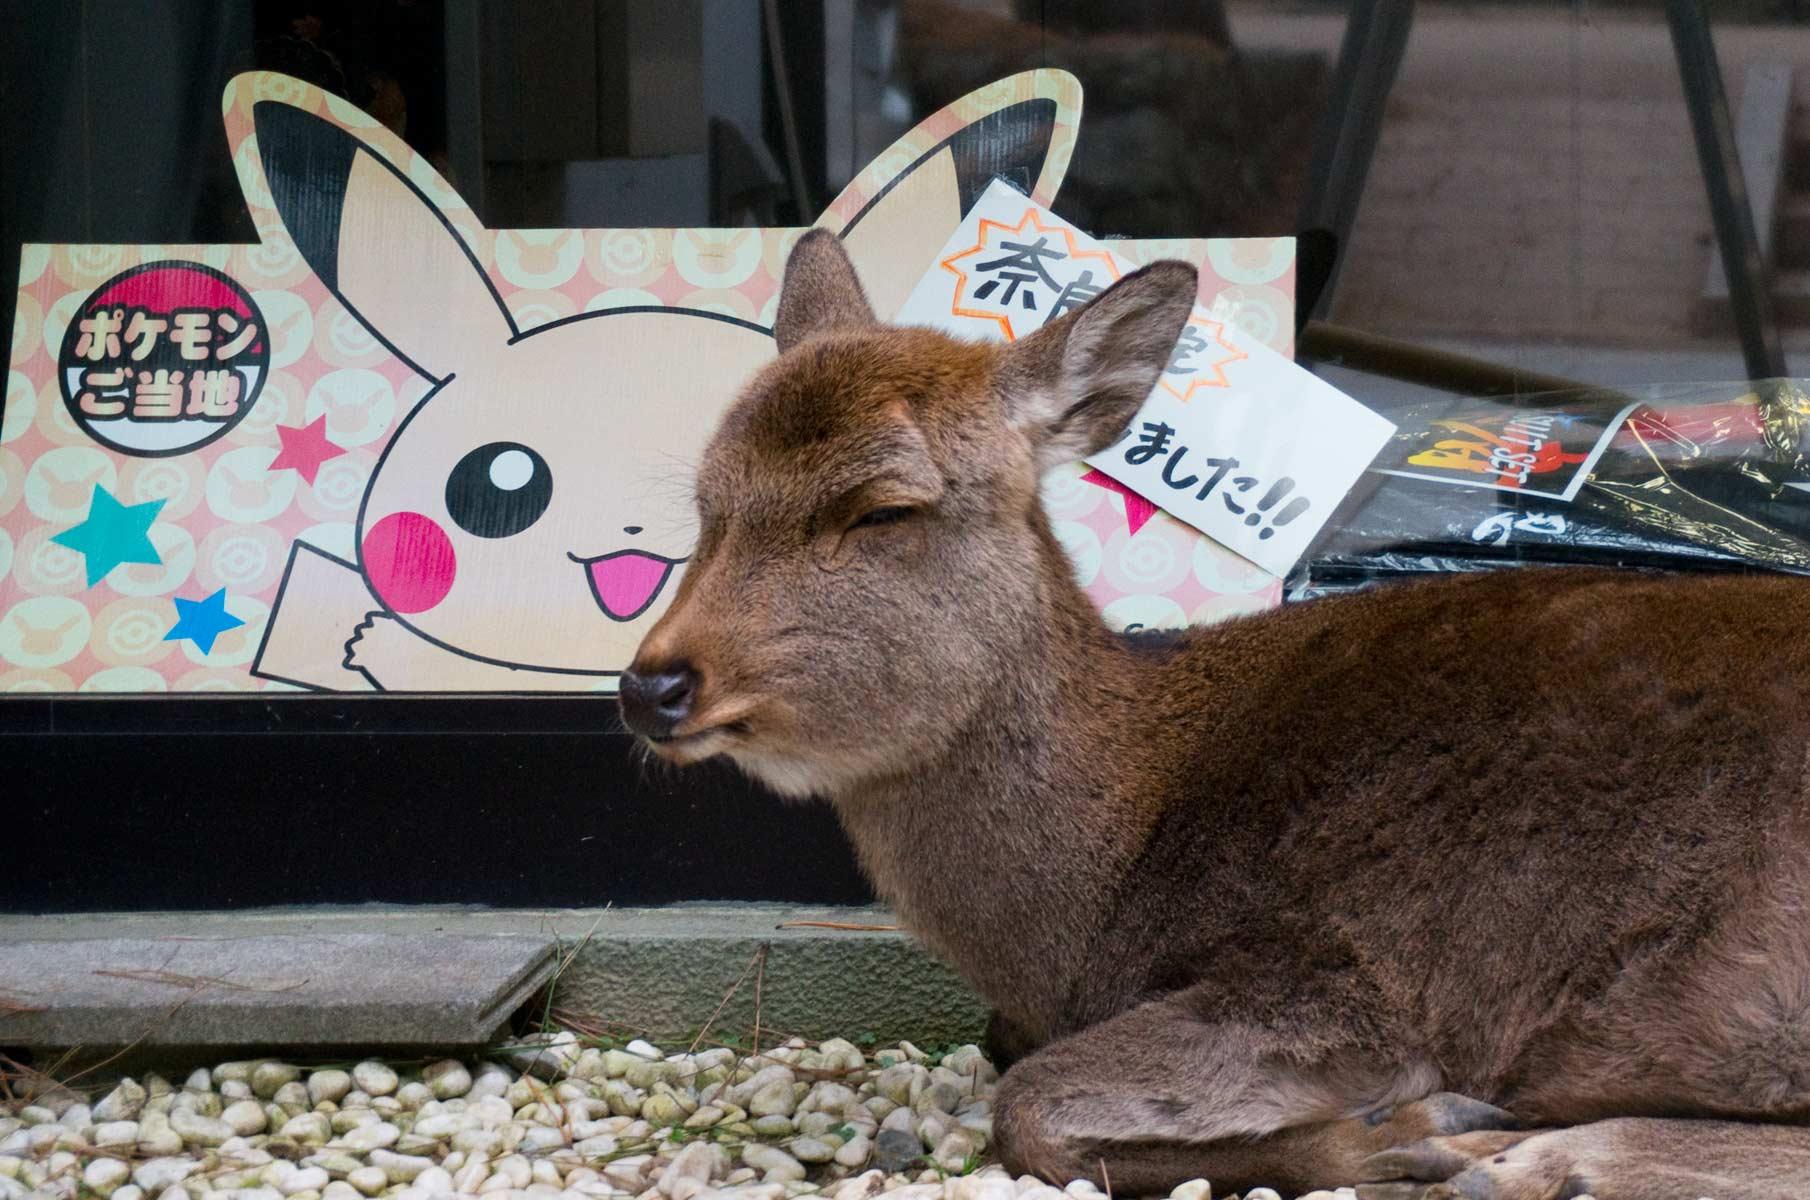 Schlafendes Reh im Nara Park in Nara, Japan